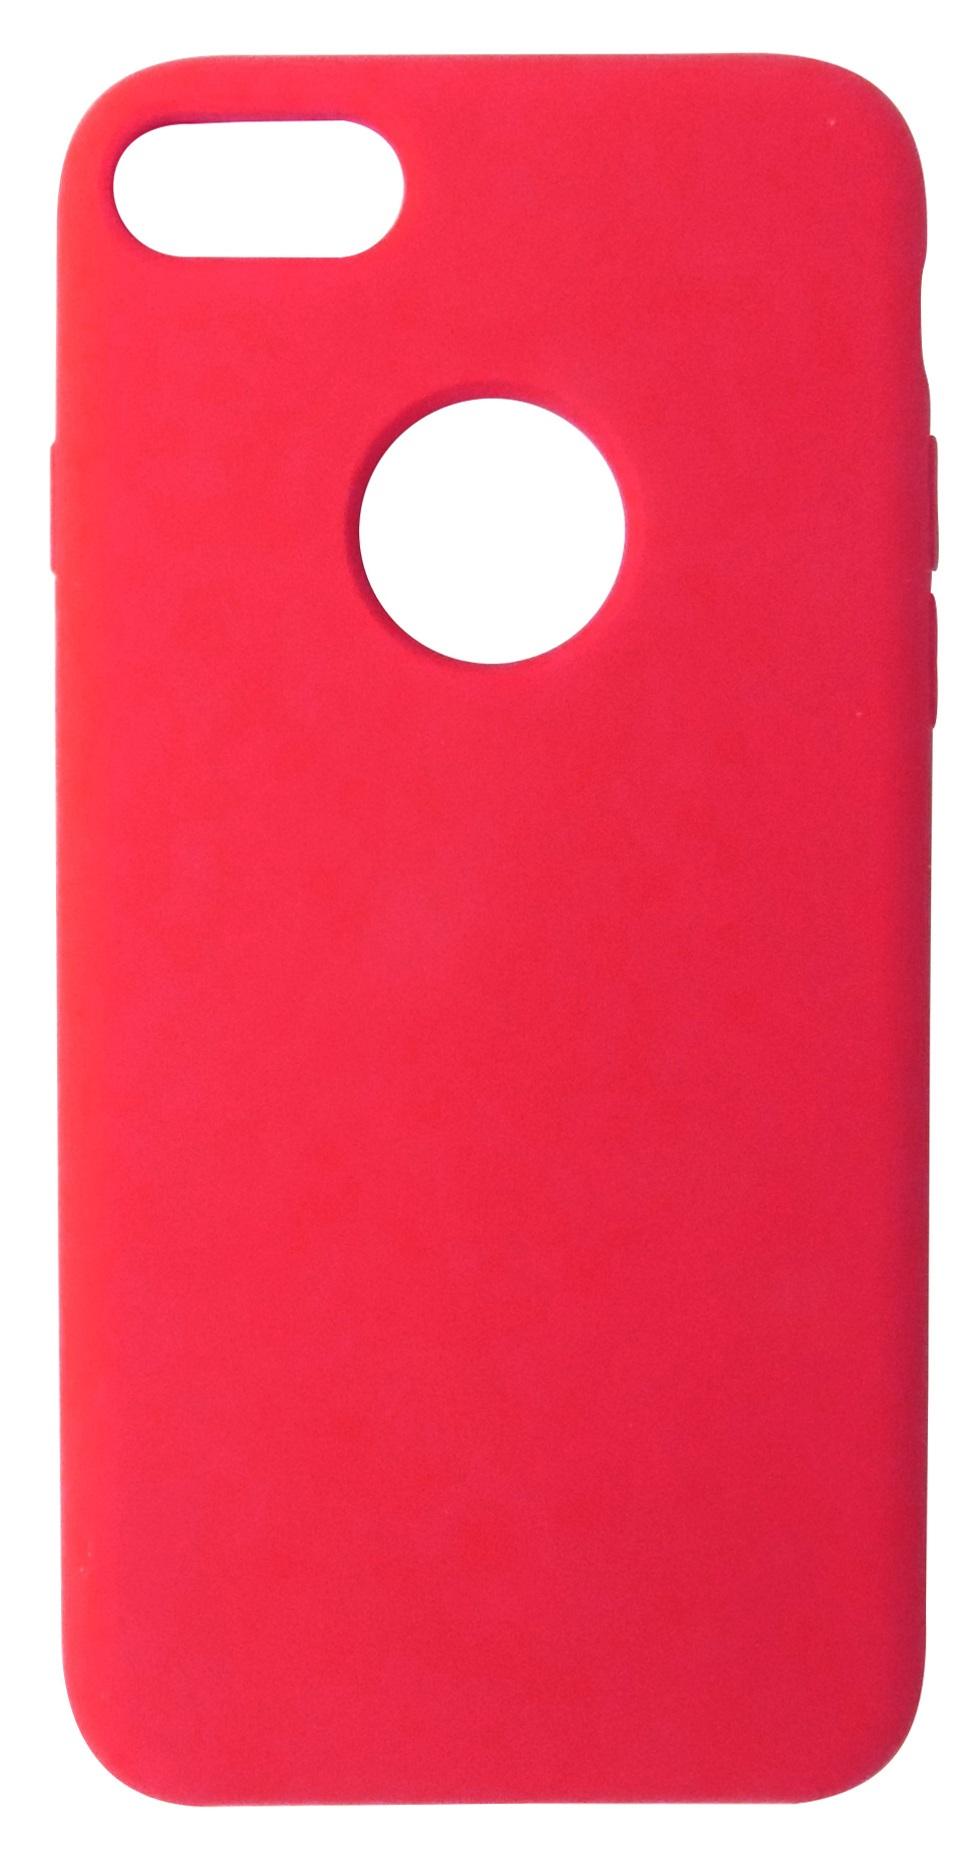 Husa silicon TPU Matte (anti-amprenta, anti-alunecare) rosie pentru Apple iPhone 7/8